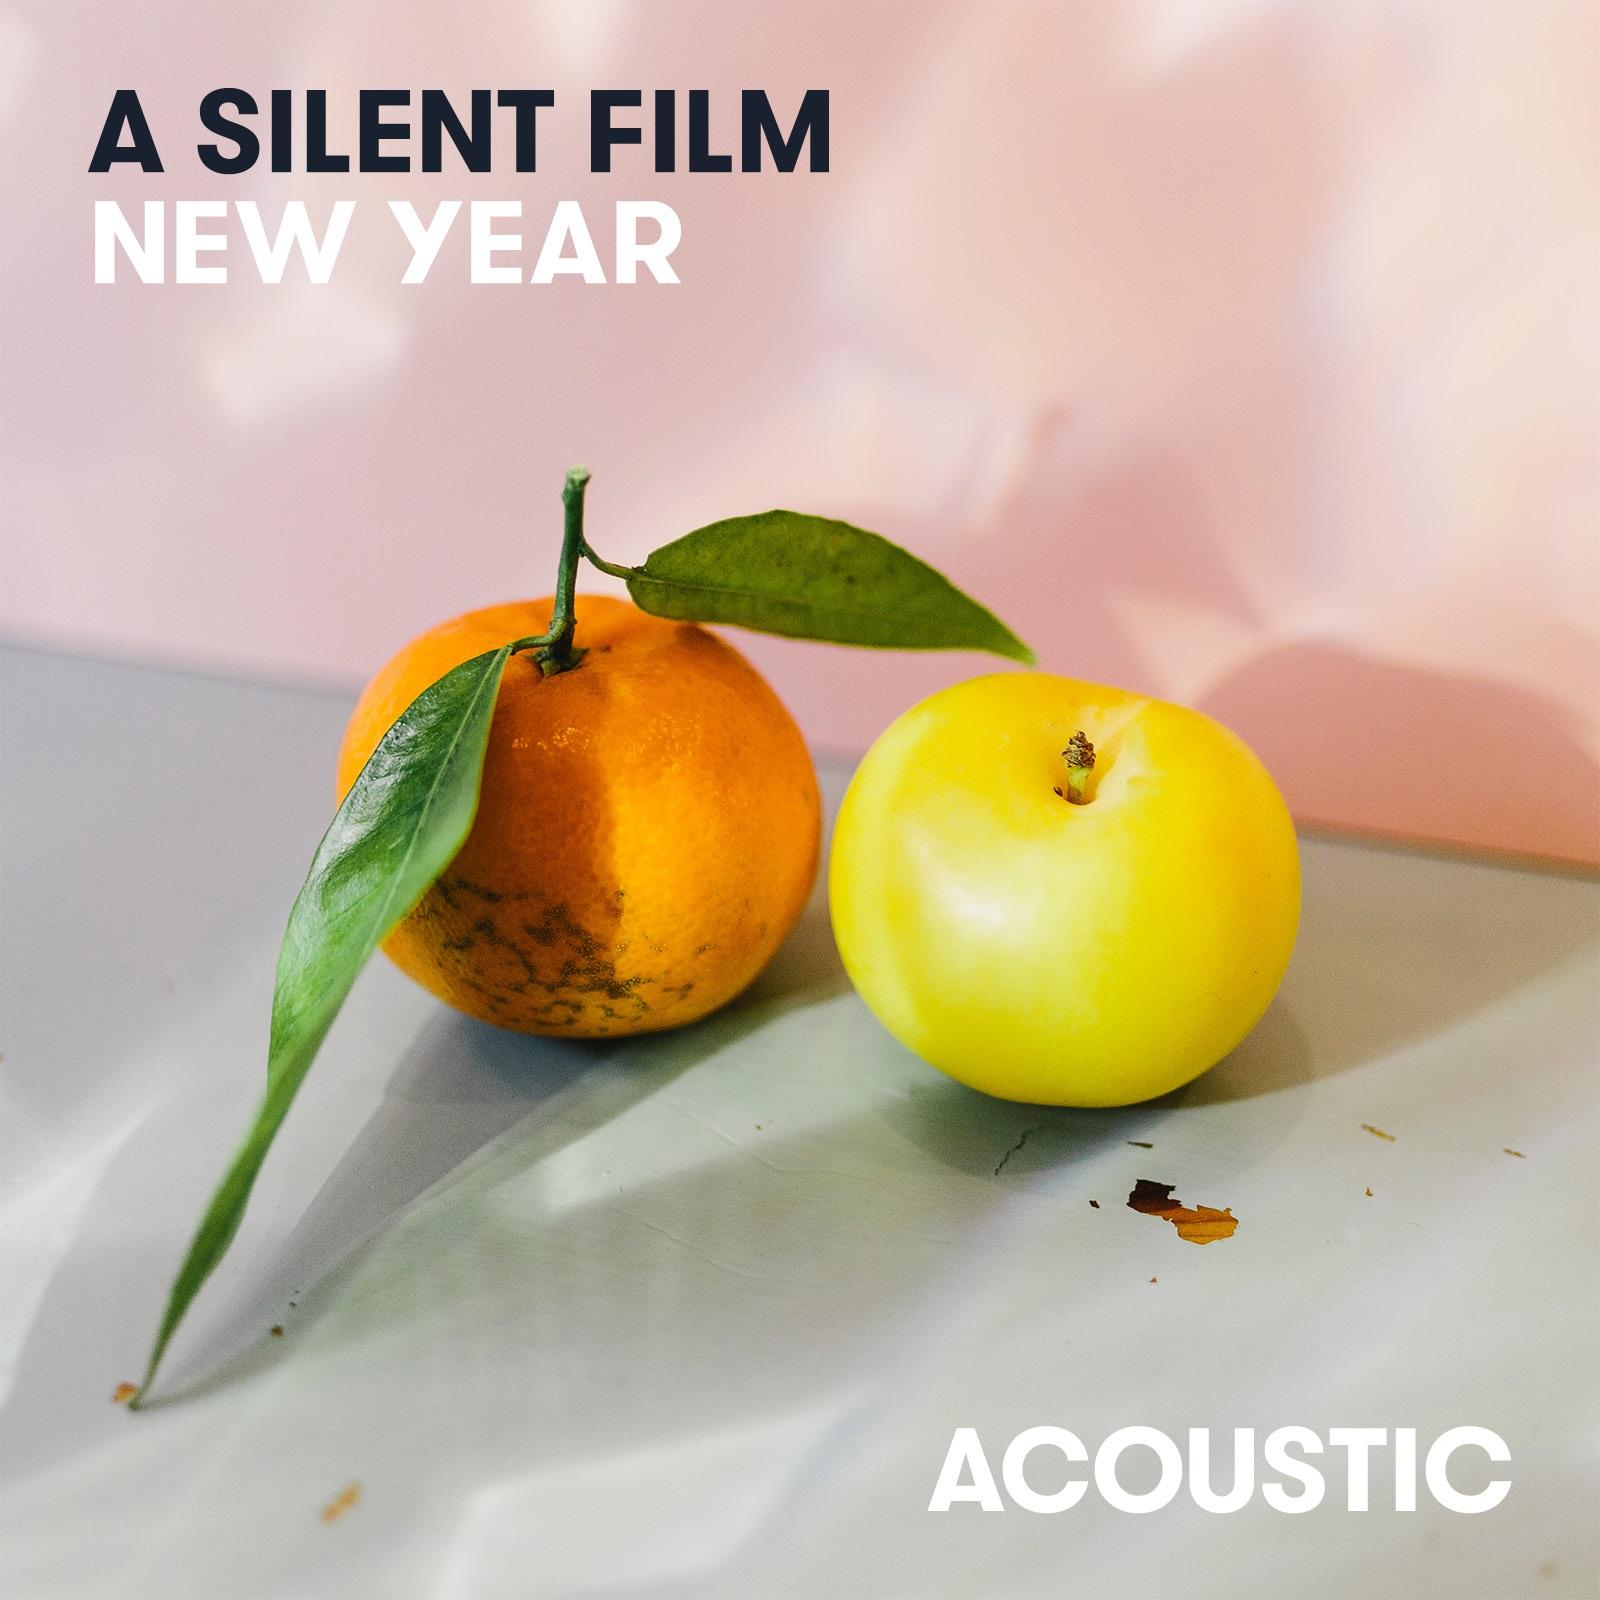 http://noisetrade.com/asilentfilm/new-year-acoustics-ep